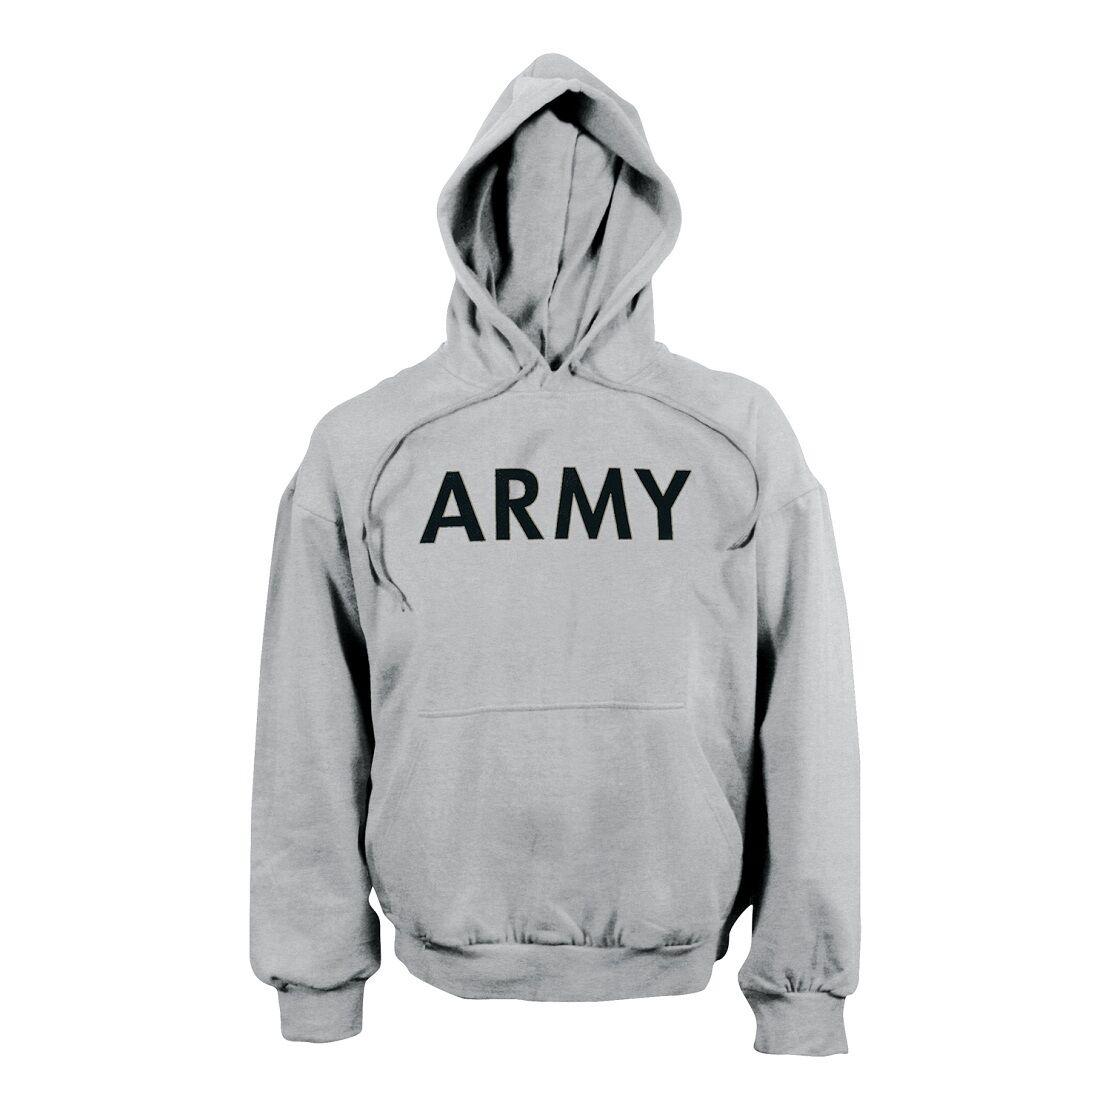 Army Hoodie con Cappuccio Sport Shirt US SPORT HOODY FELPA GRIGIO XL